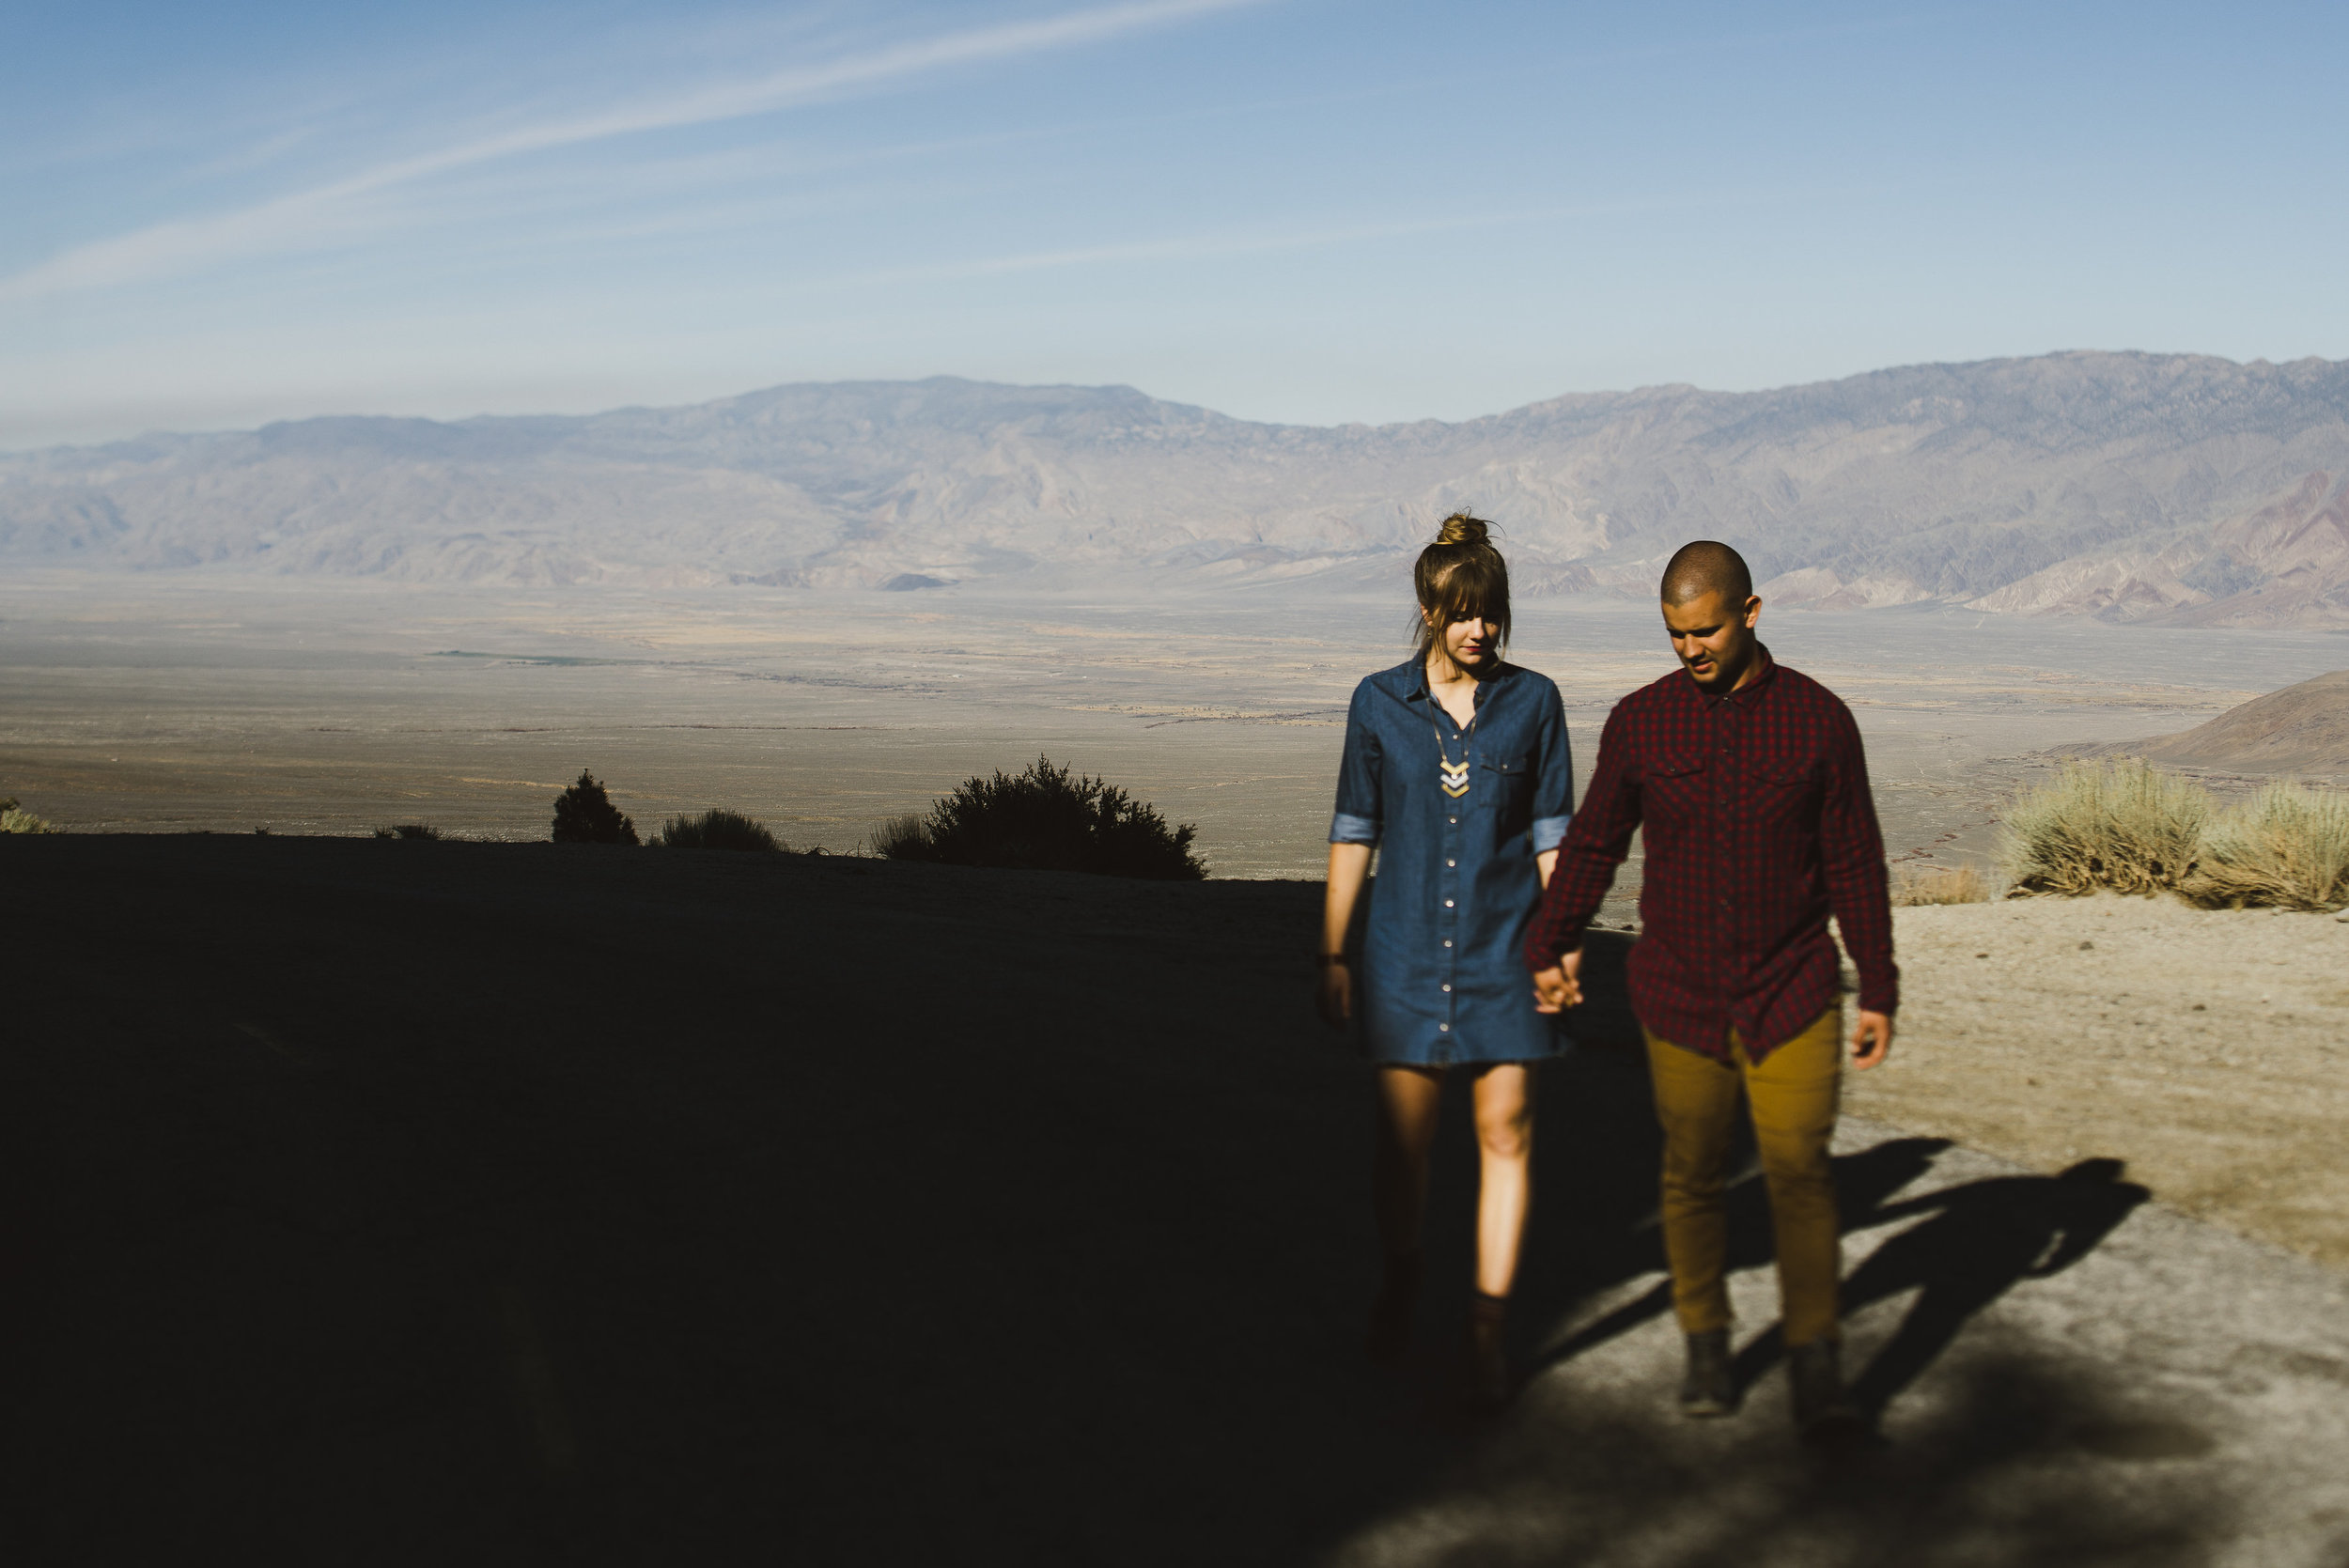 Isaiah&TaylorPhotography-Jared&KelseyEngagement-148.jpg